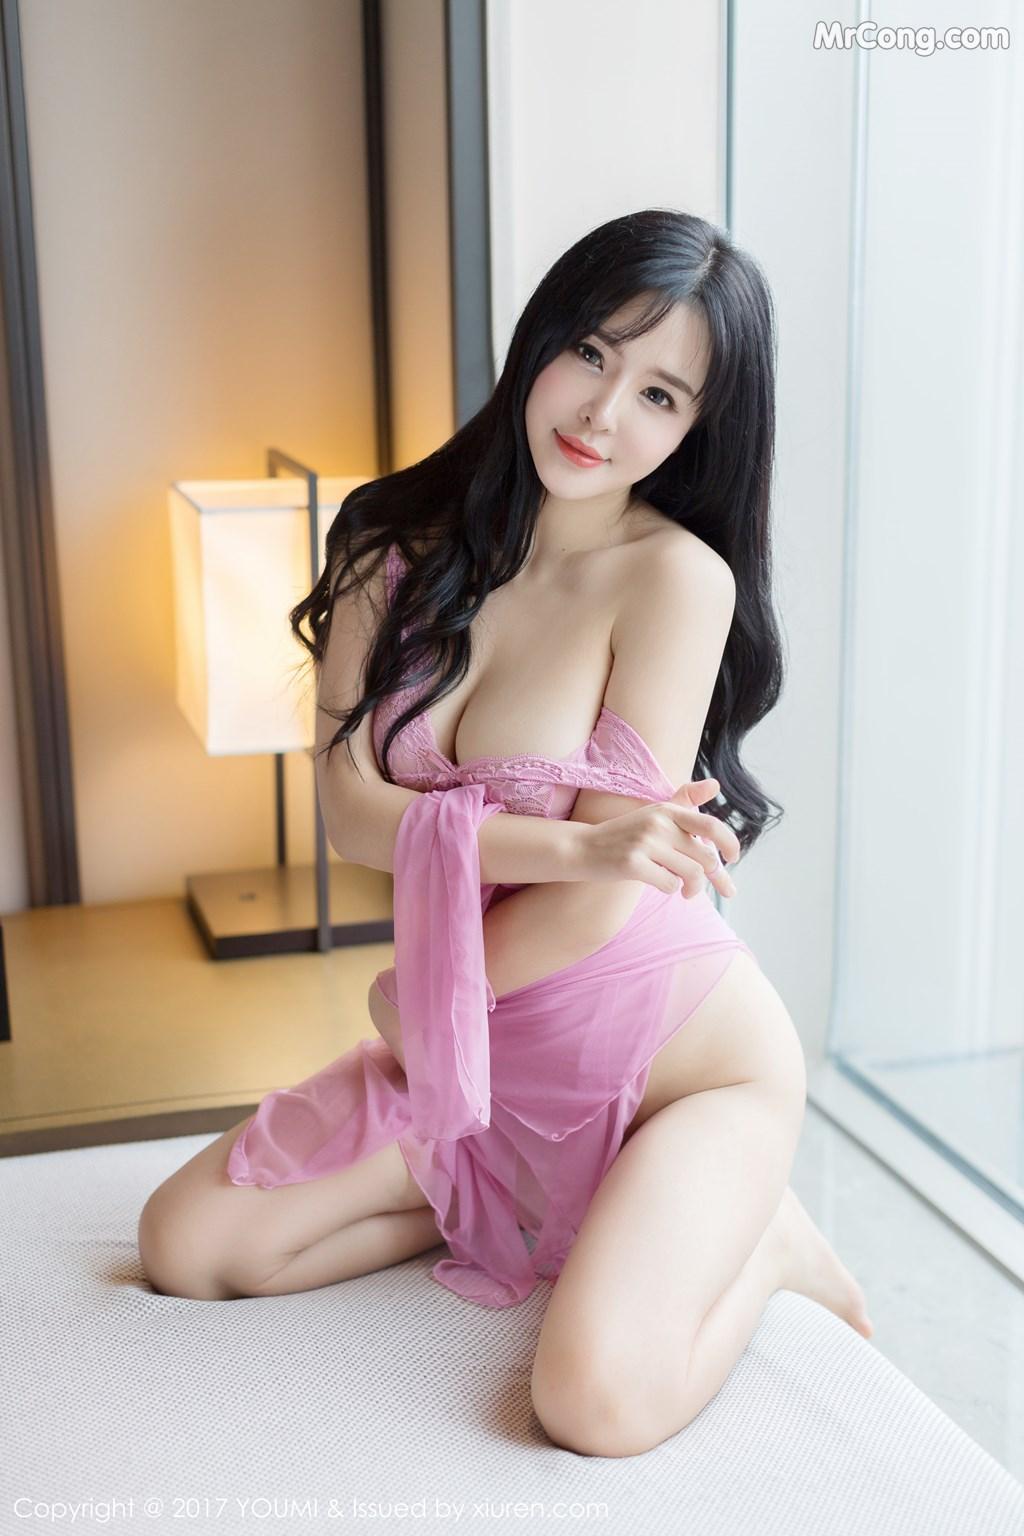 Image YouMi-No.067-Liu-Yu-Er-MrCong.com-016 in post YouMi No.067: Người mẫu Liu Yu Er (刘钰儿) (45 ảnh)